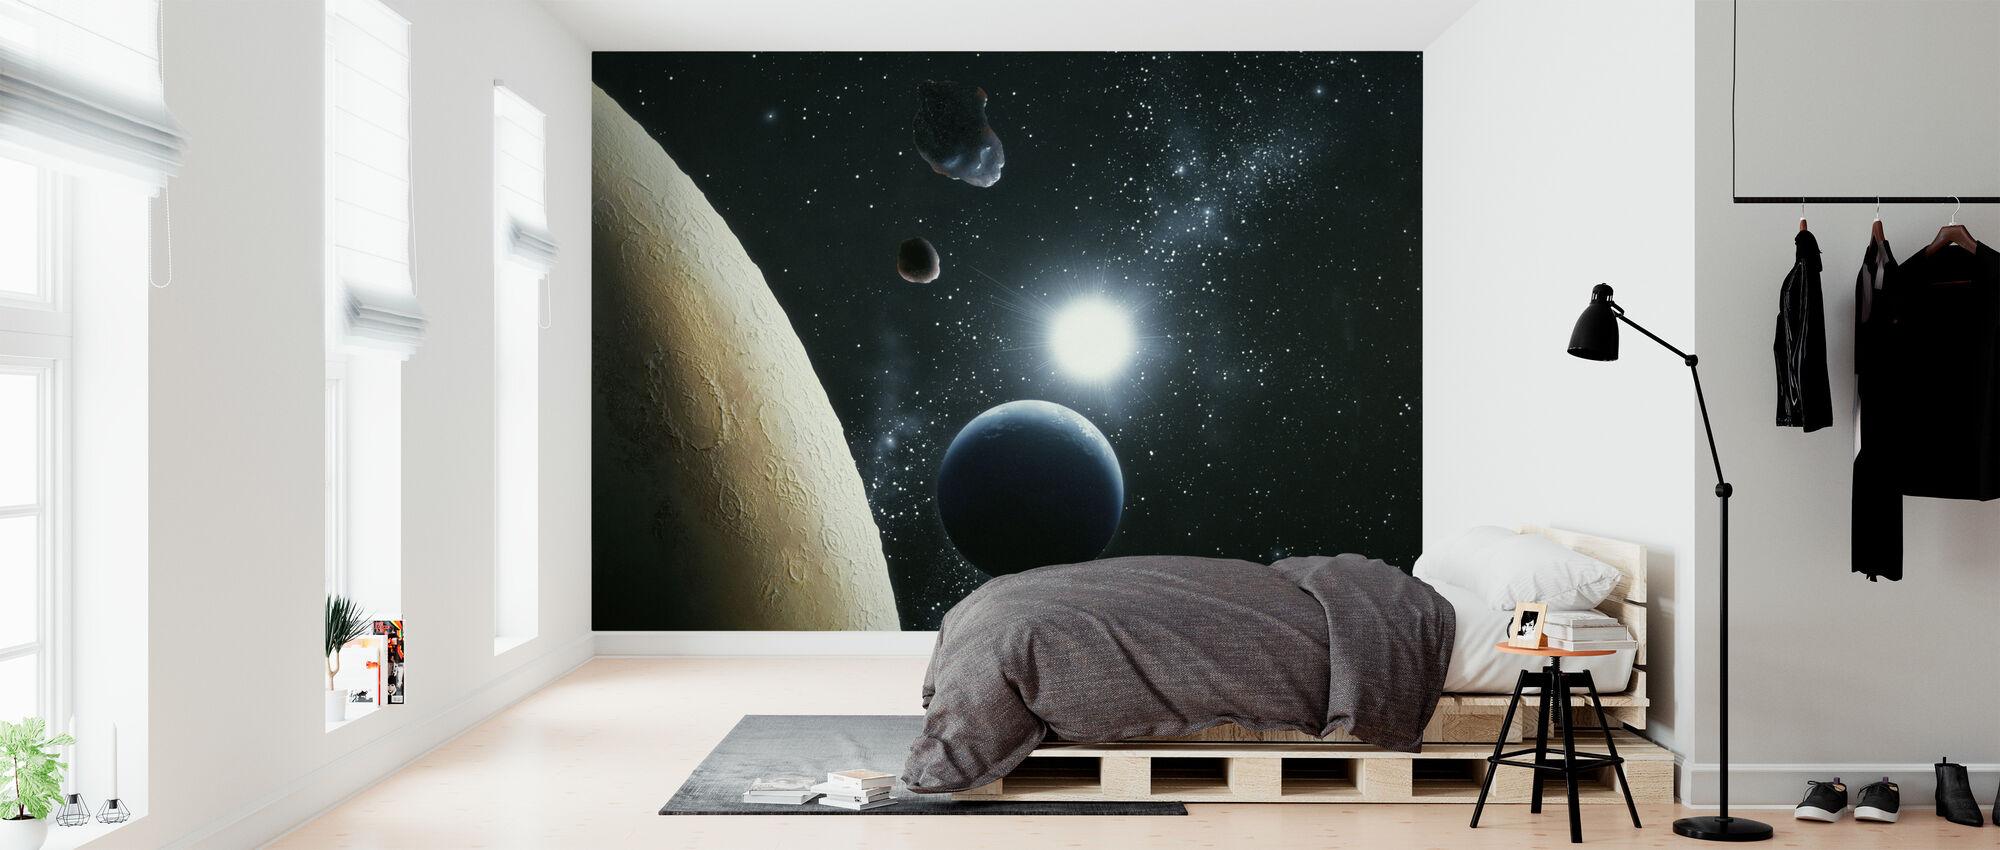 Kuu ja maa - Tapetti - Makuuhuone